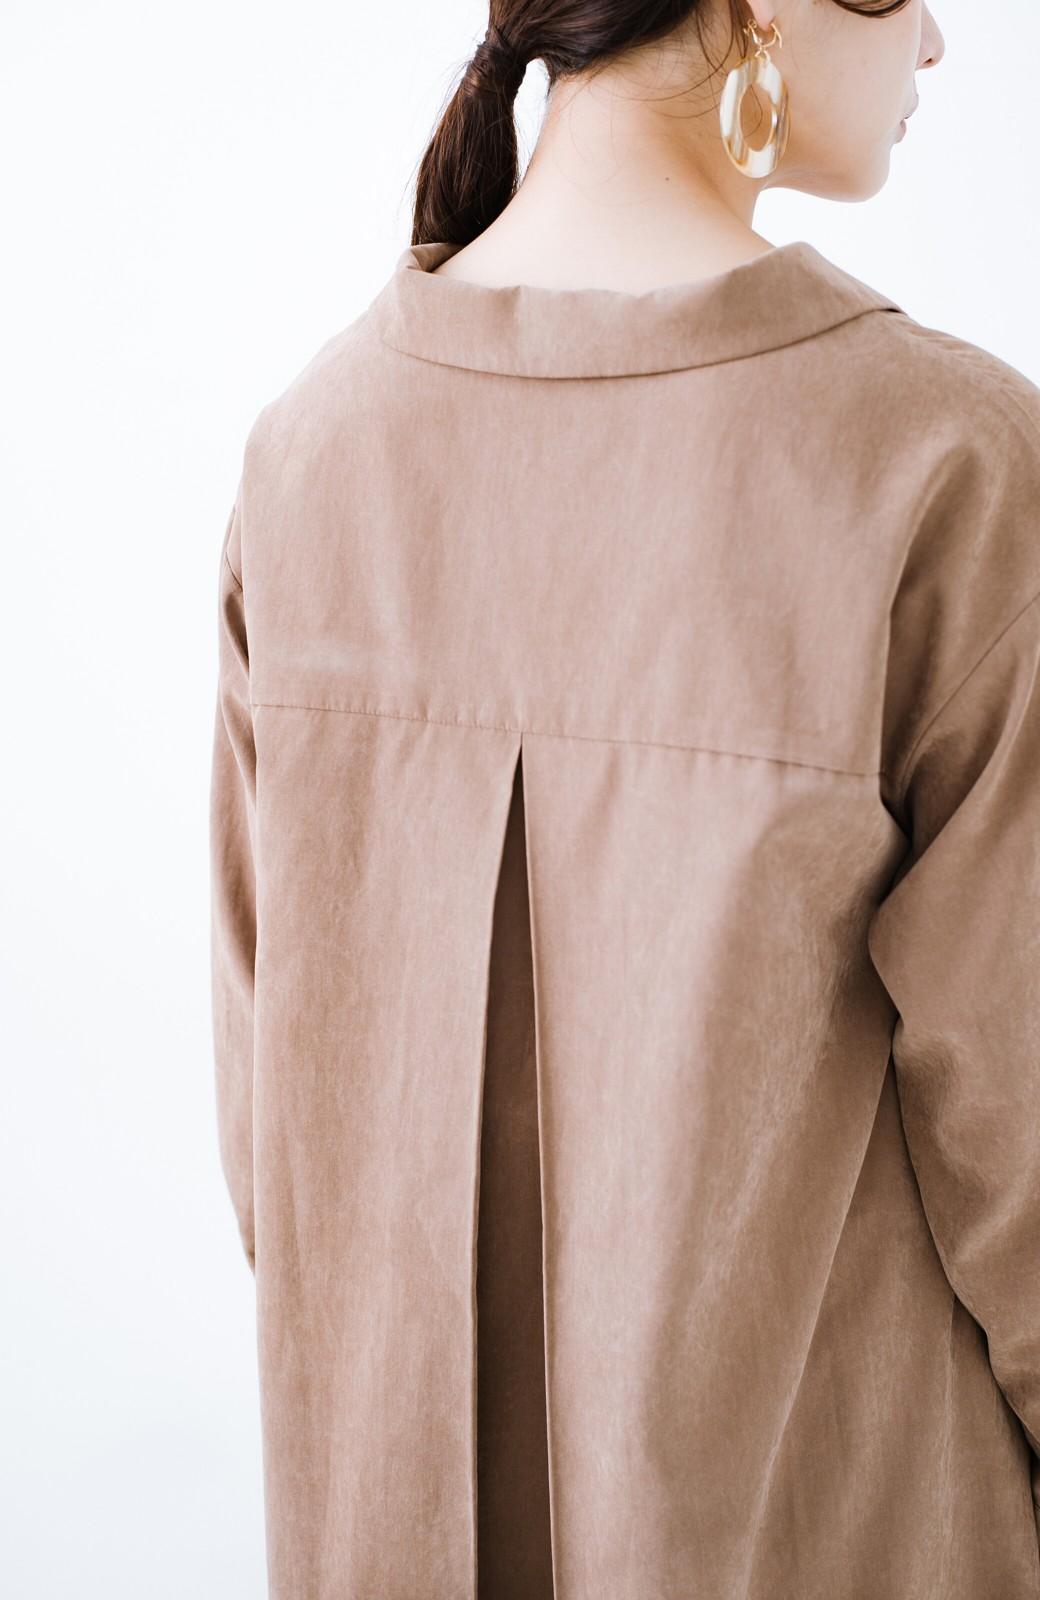 haco! 太ってもばれずに羽織っても便利なAラインワンピース <ブラウン>の商品写真5